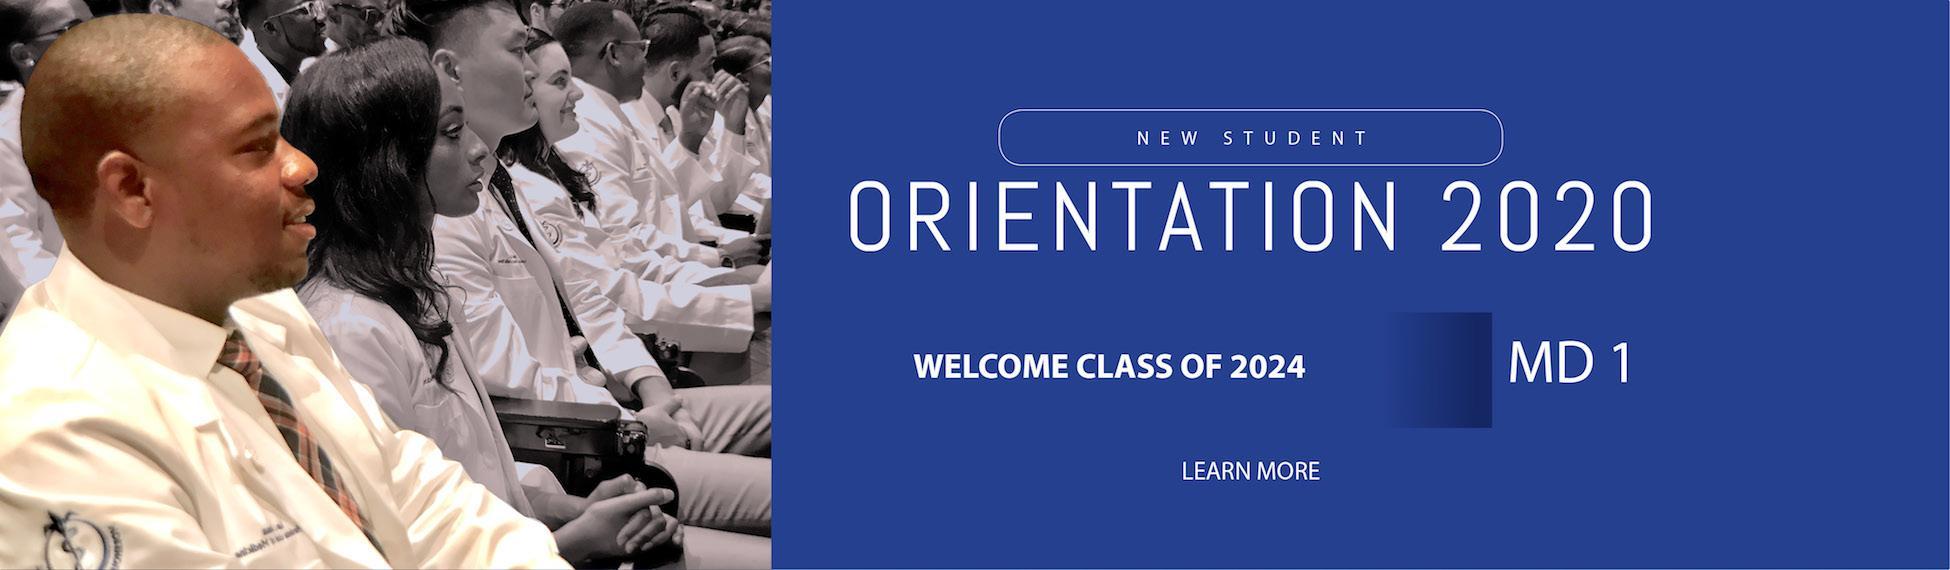 MD Orientation 2020